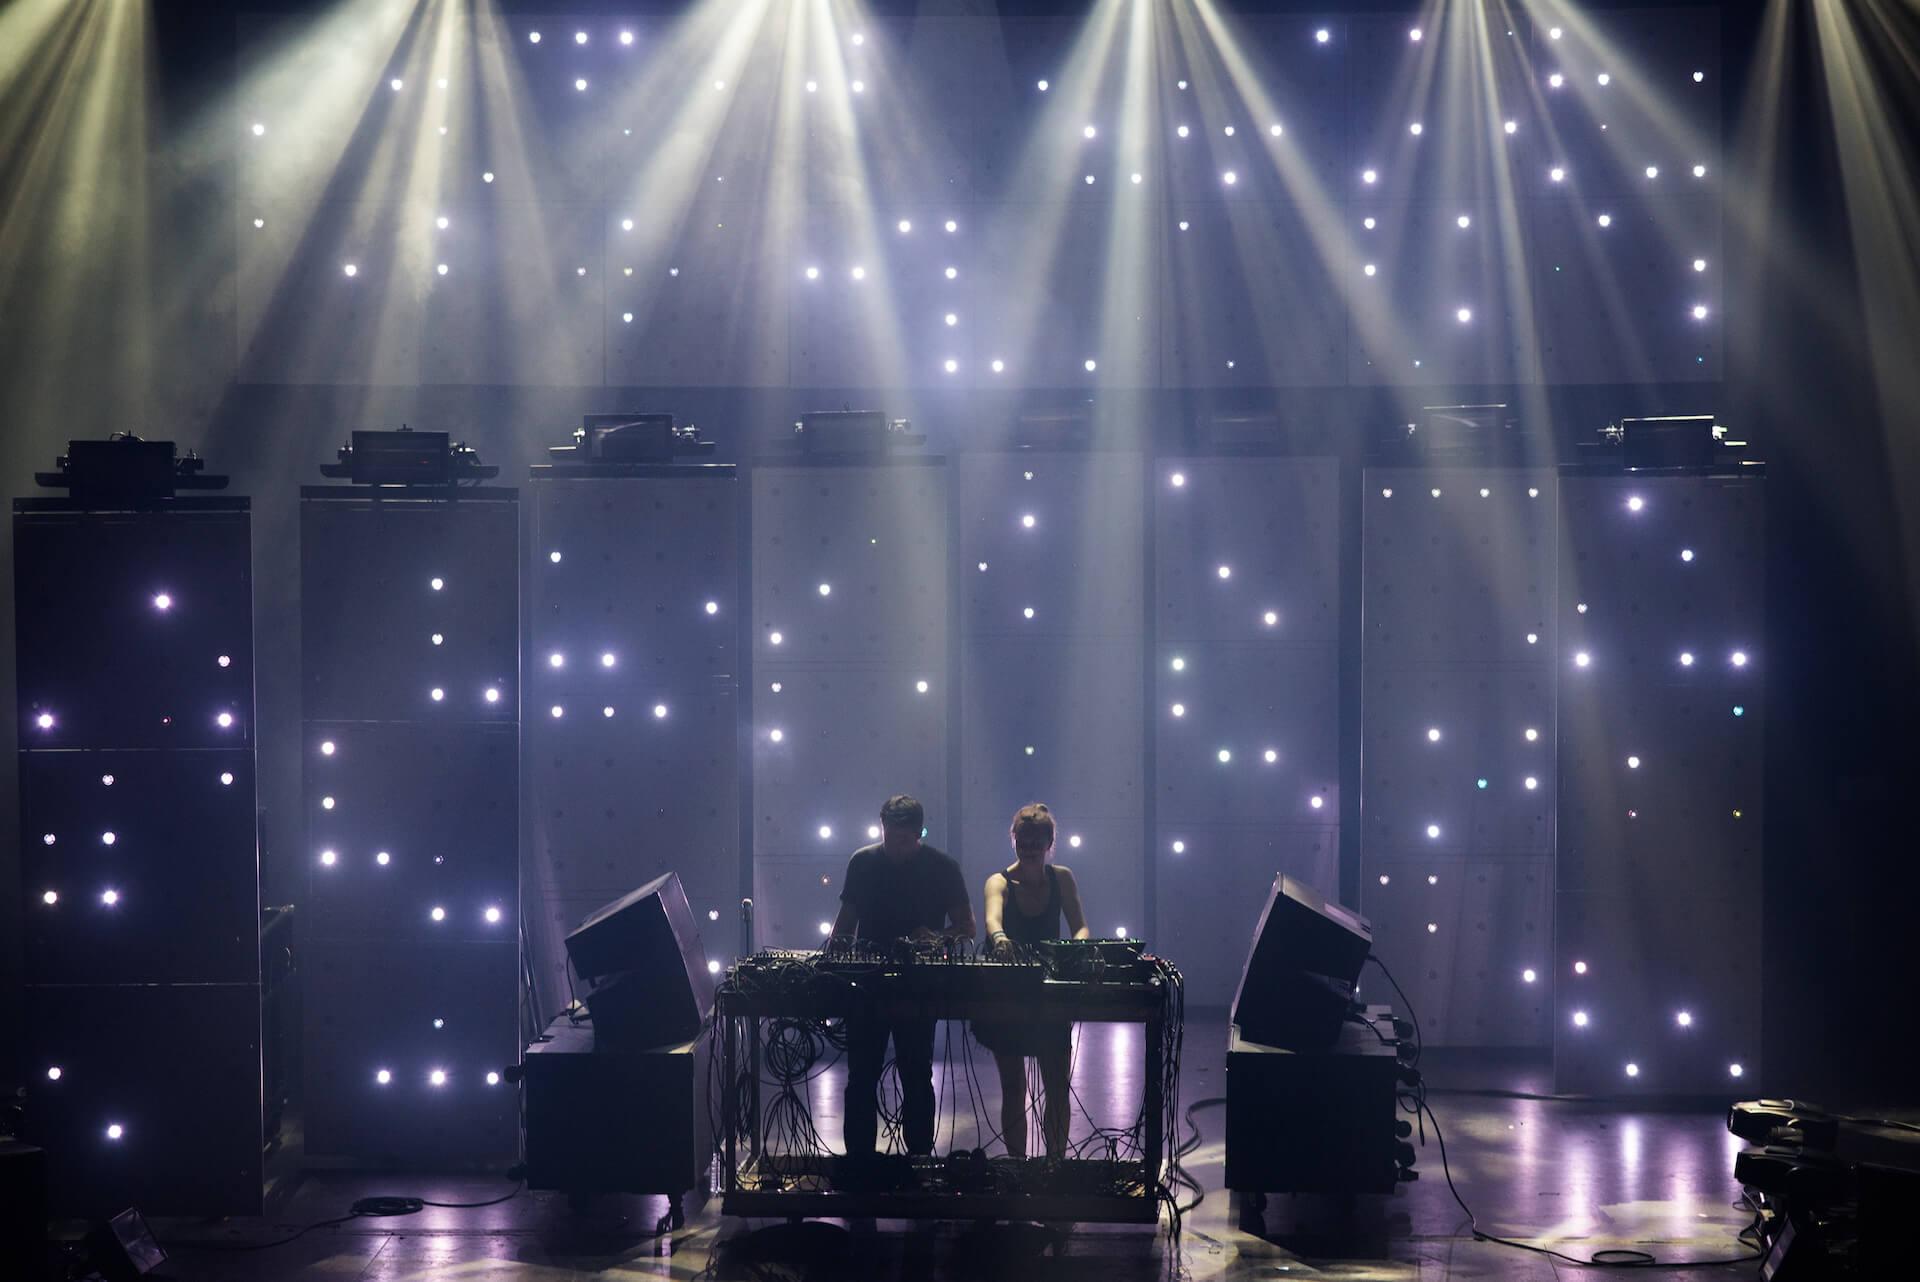 <MUTEK.JP 2019>の第一弾ラインアップにKode9&森本晃司、Tim Hecker、真鍋大度、中山晃子らが発表 music190926-mutek-1-2